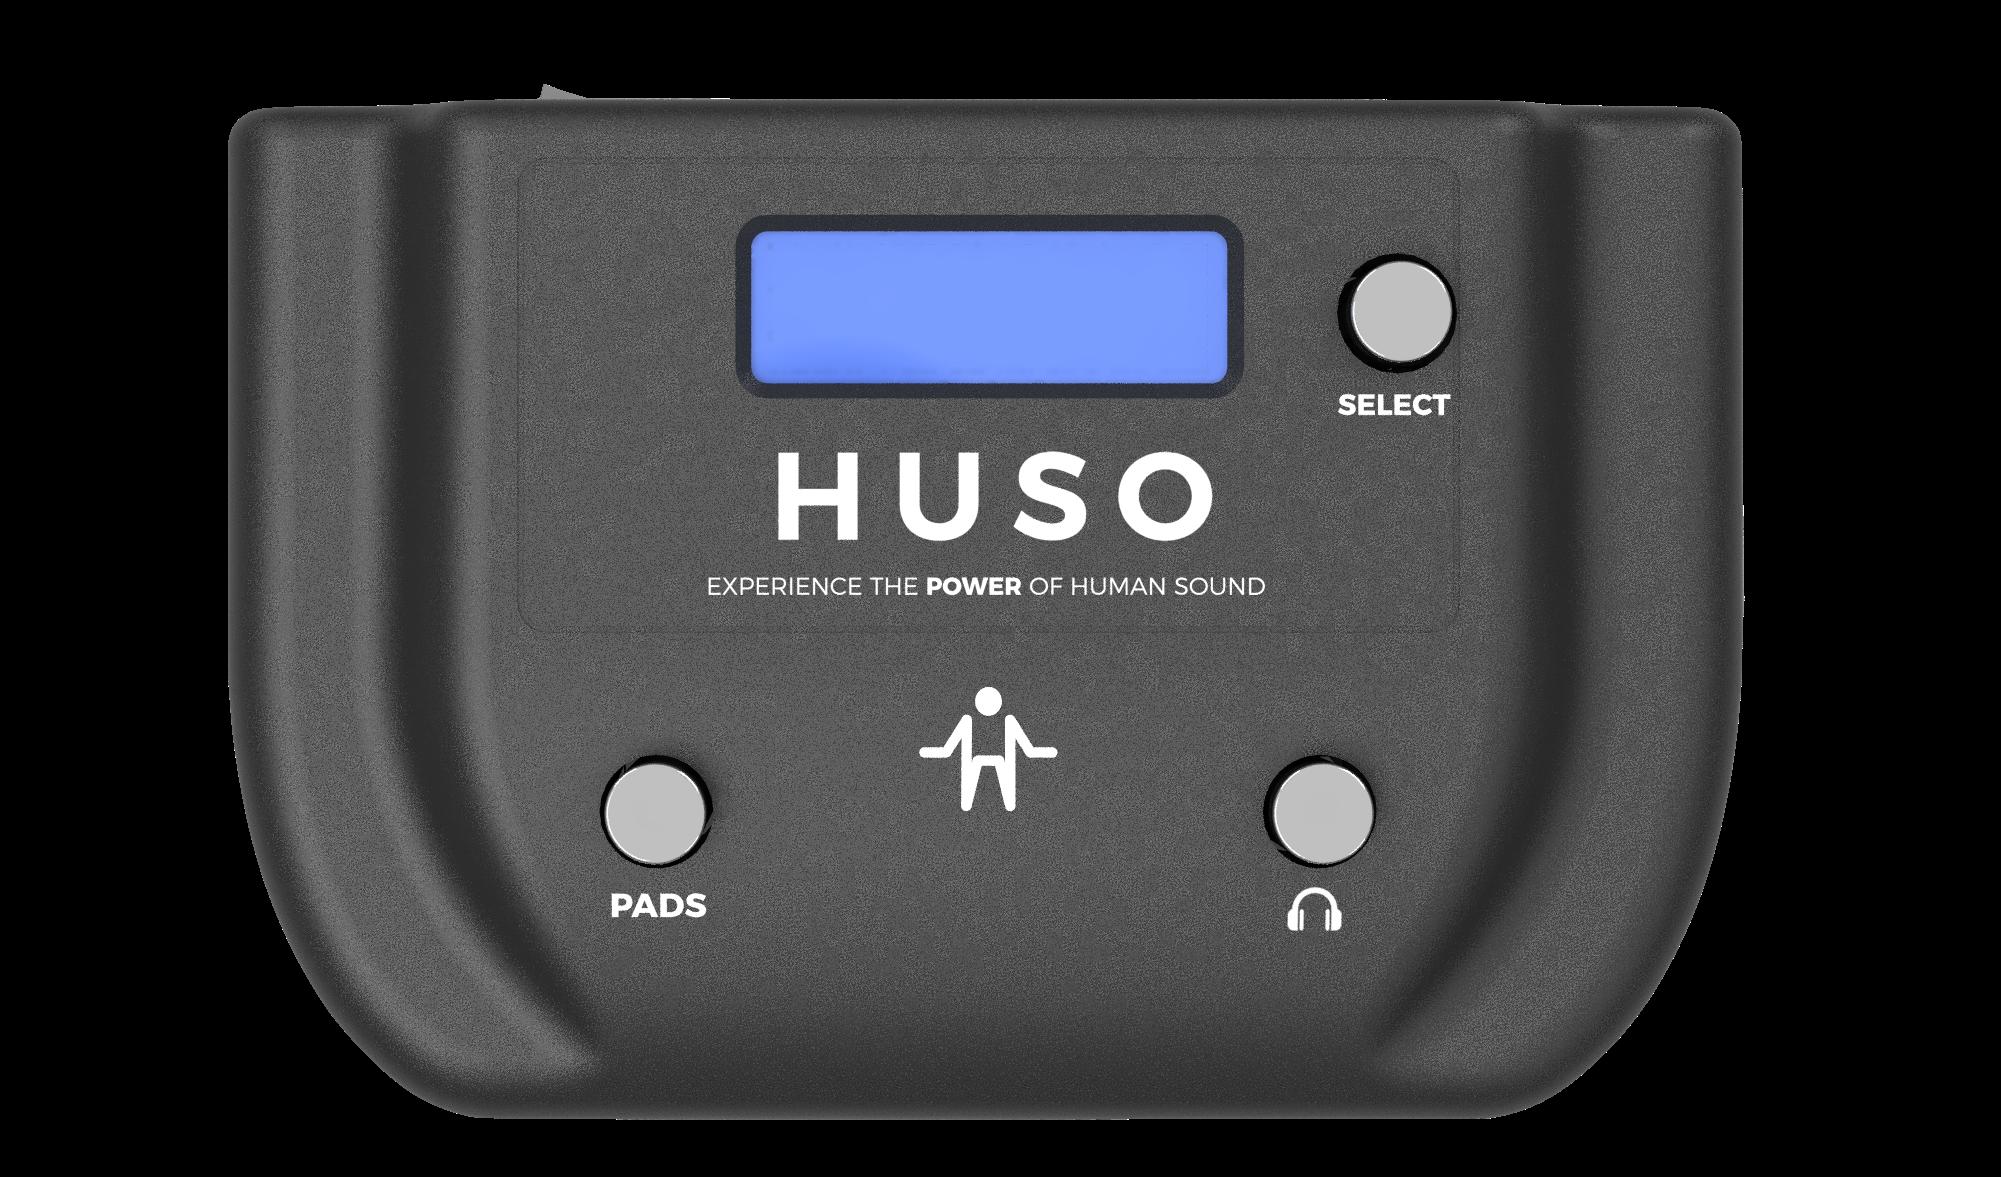 huso-john-6 (1)